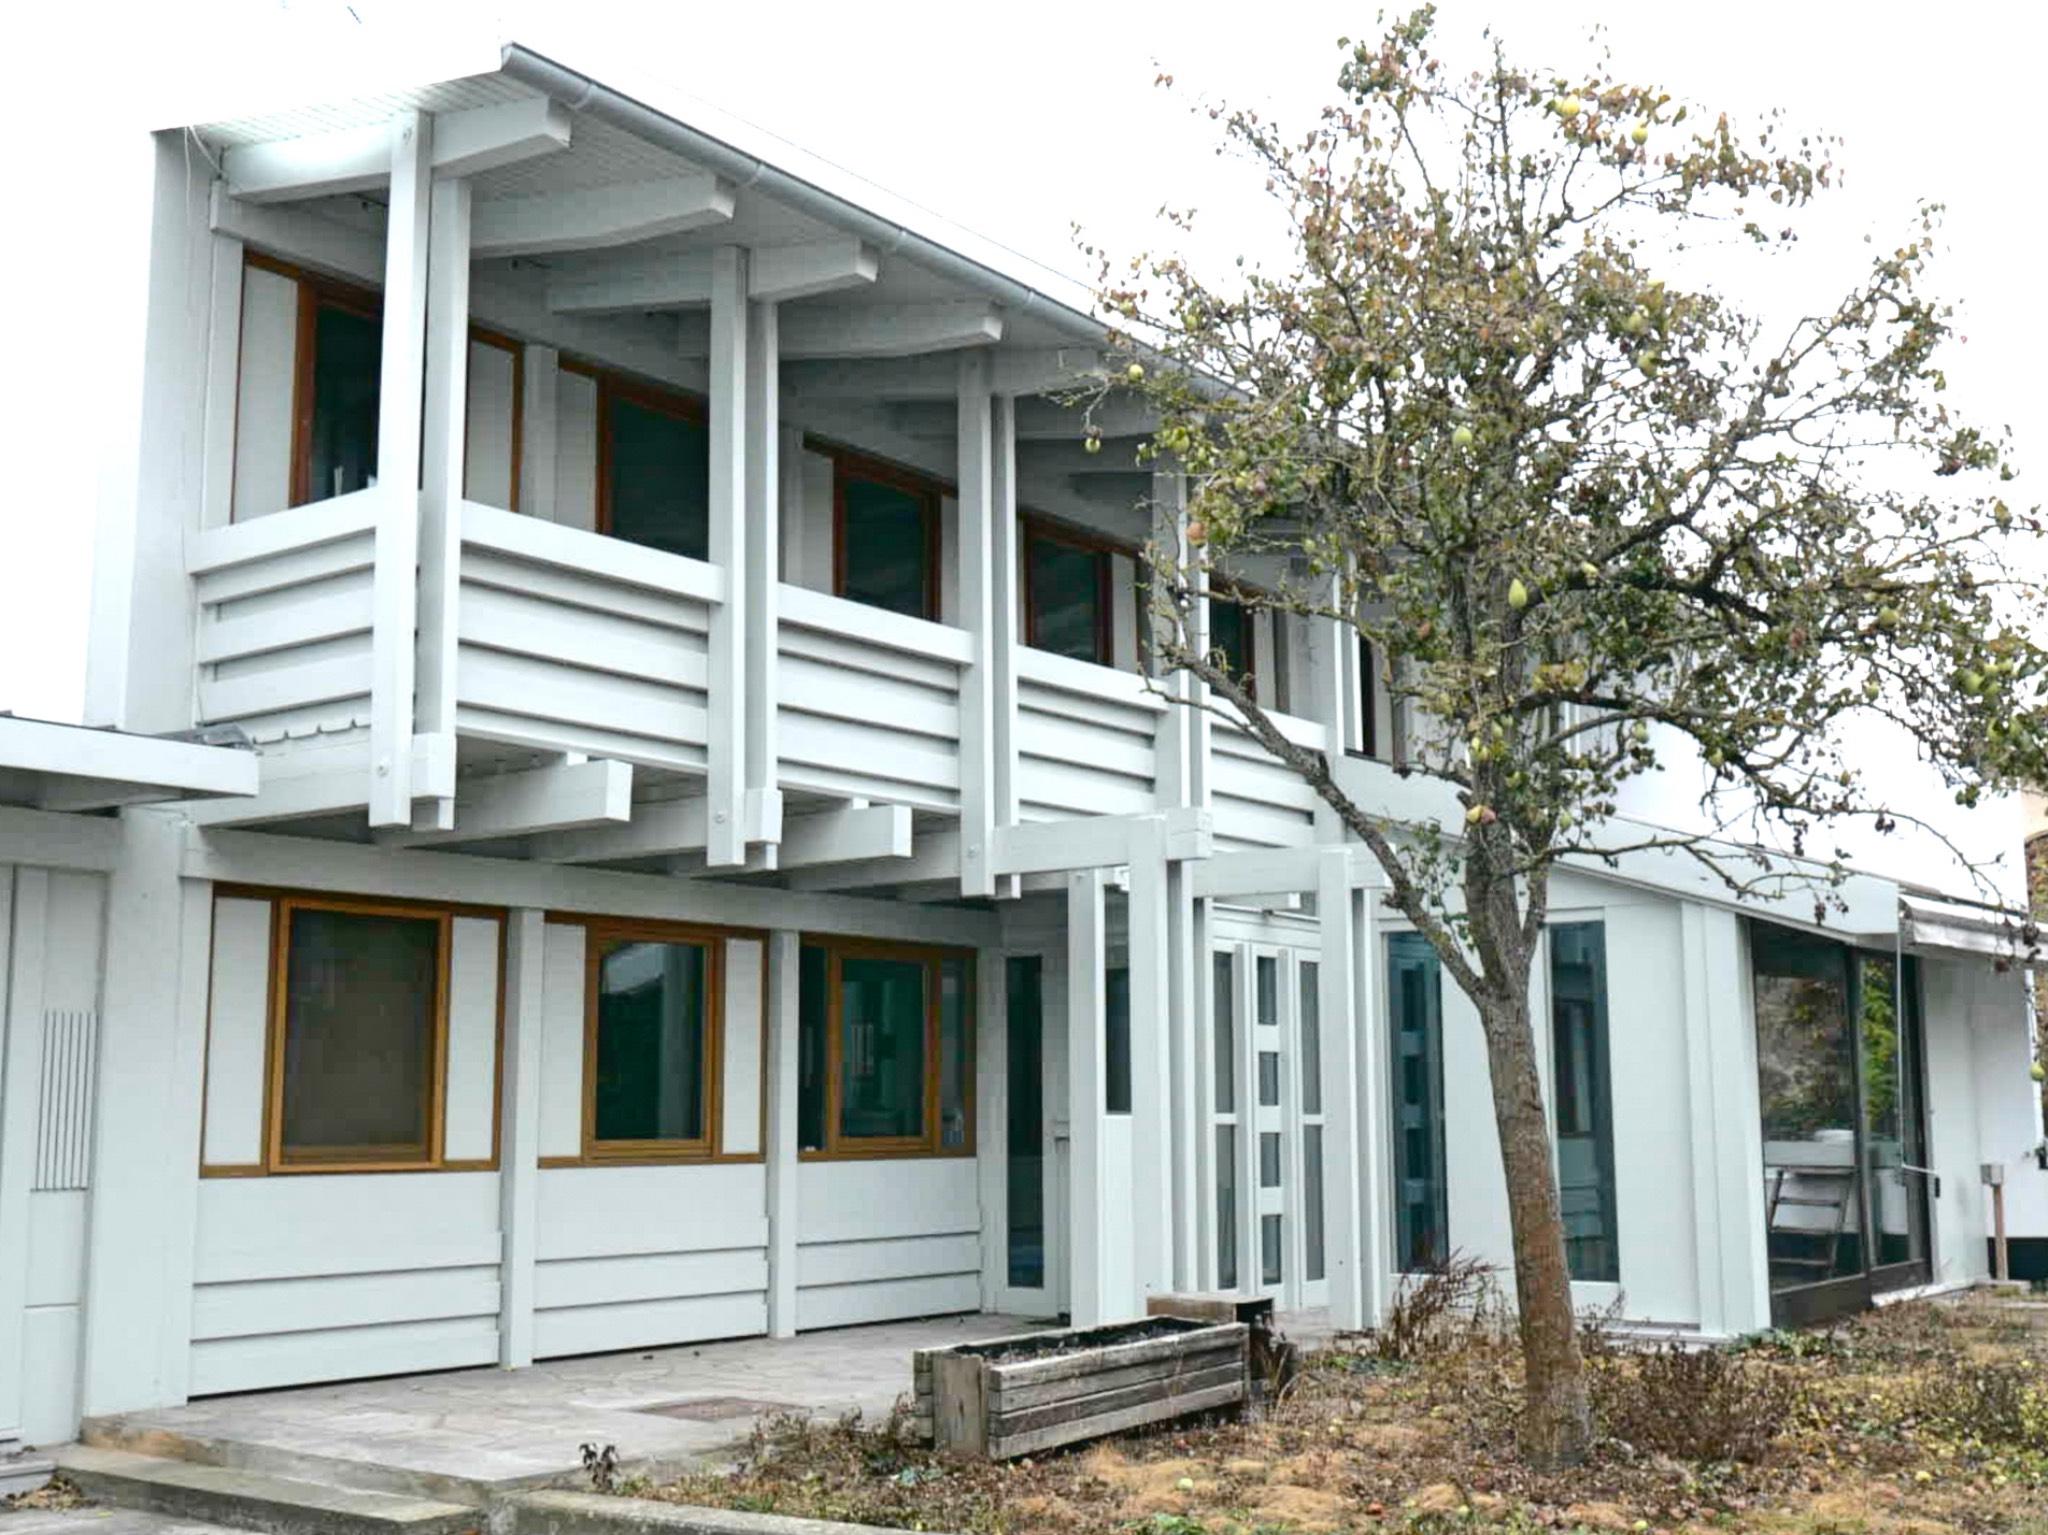 So sieht das neue Haus in Lengfeld aus. Foto: Heike Kralik